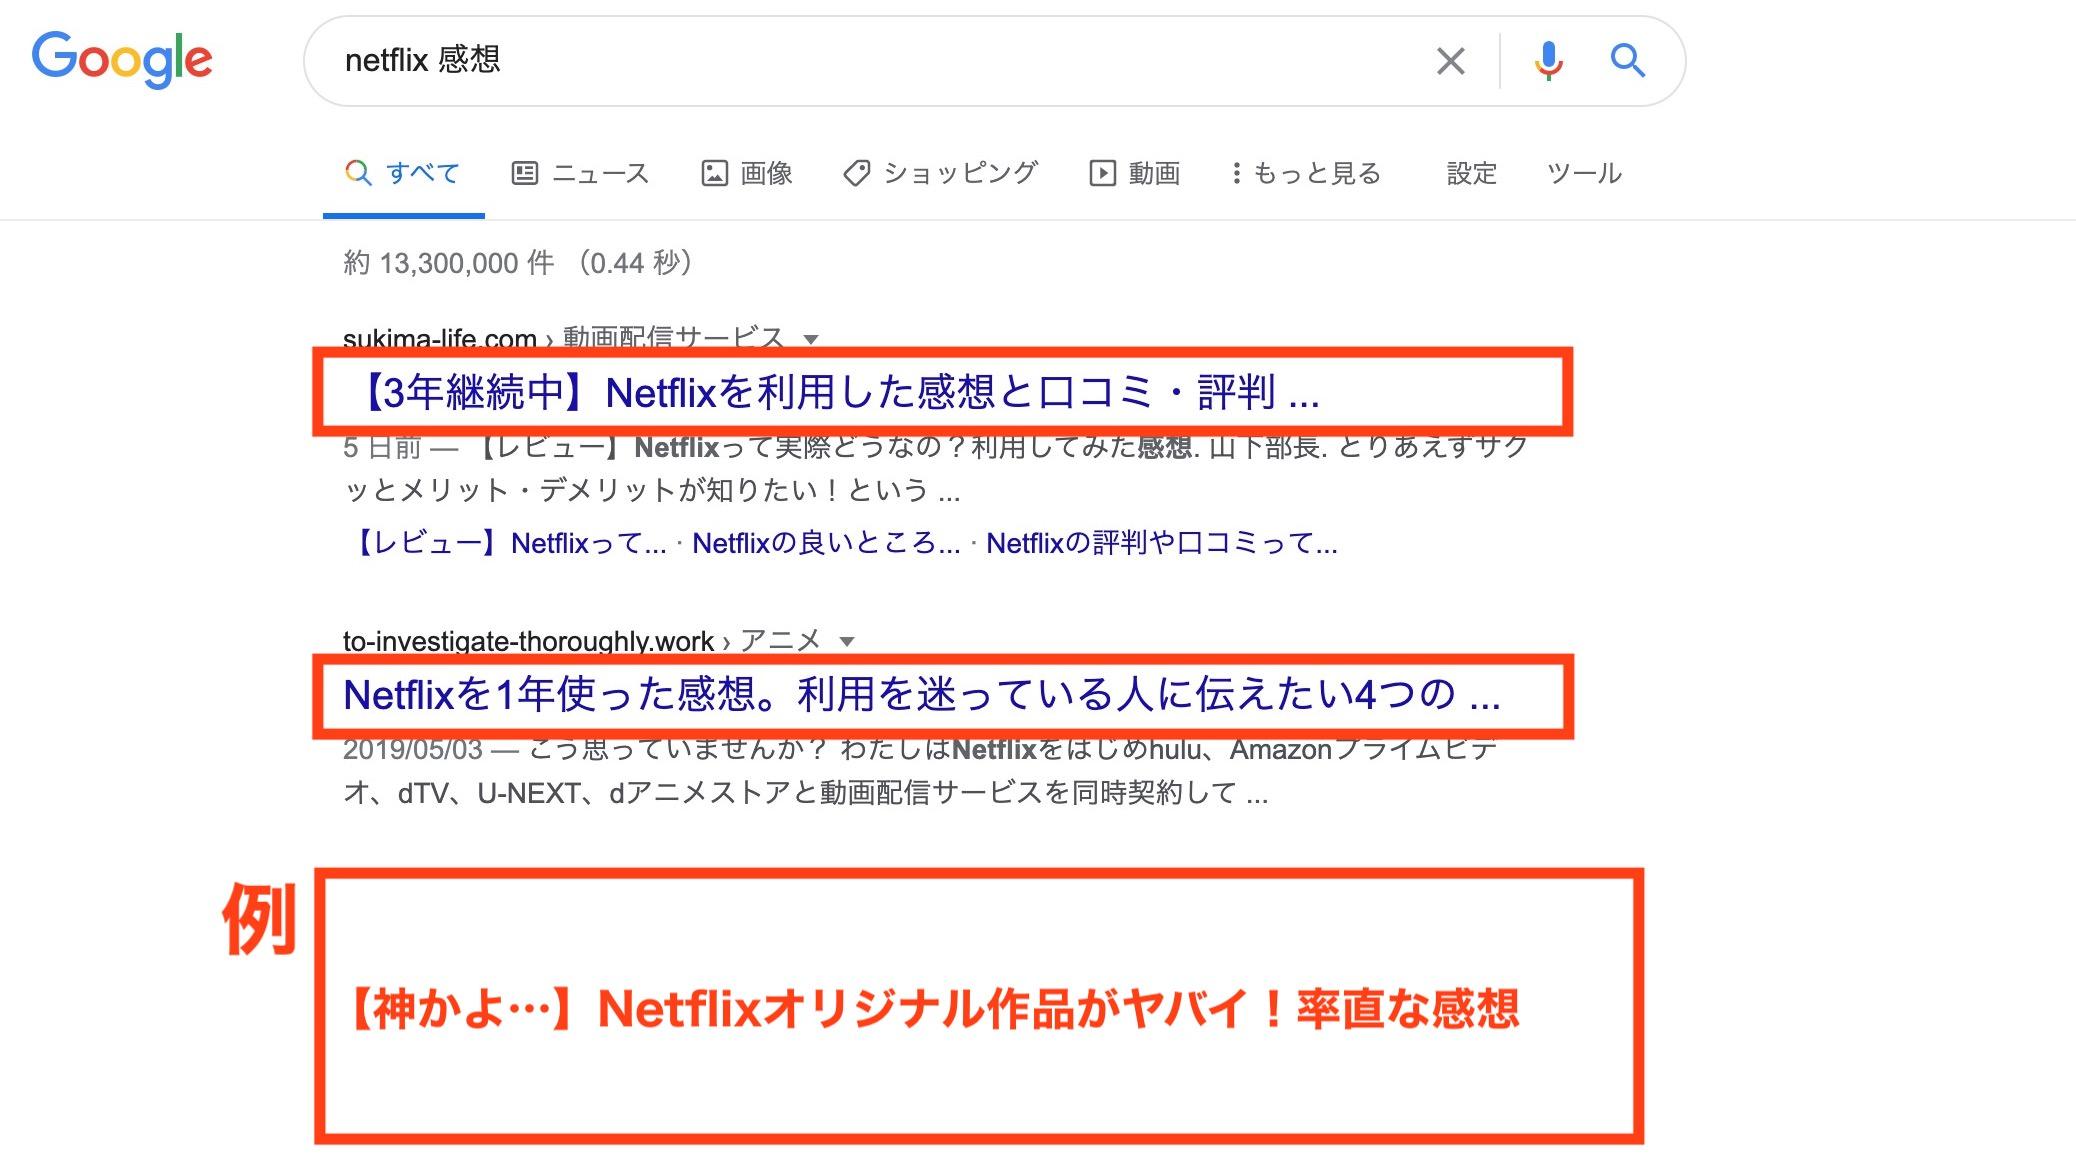 【Netflix 感想】の検索結果